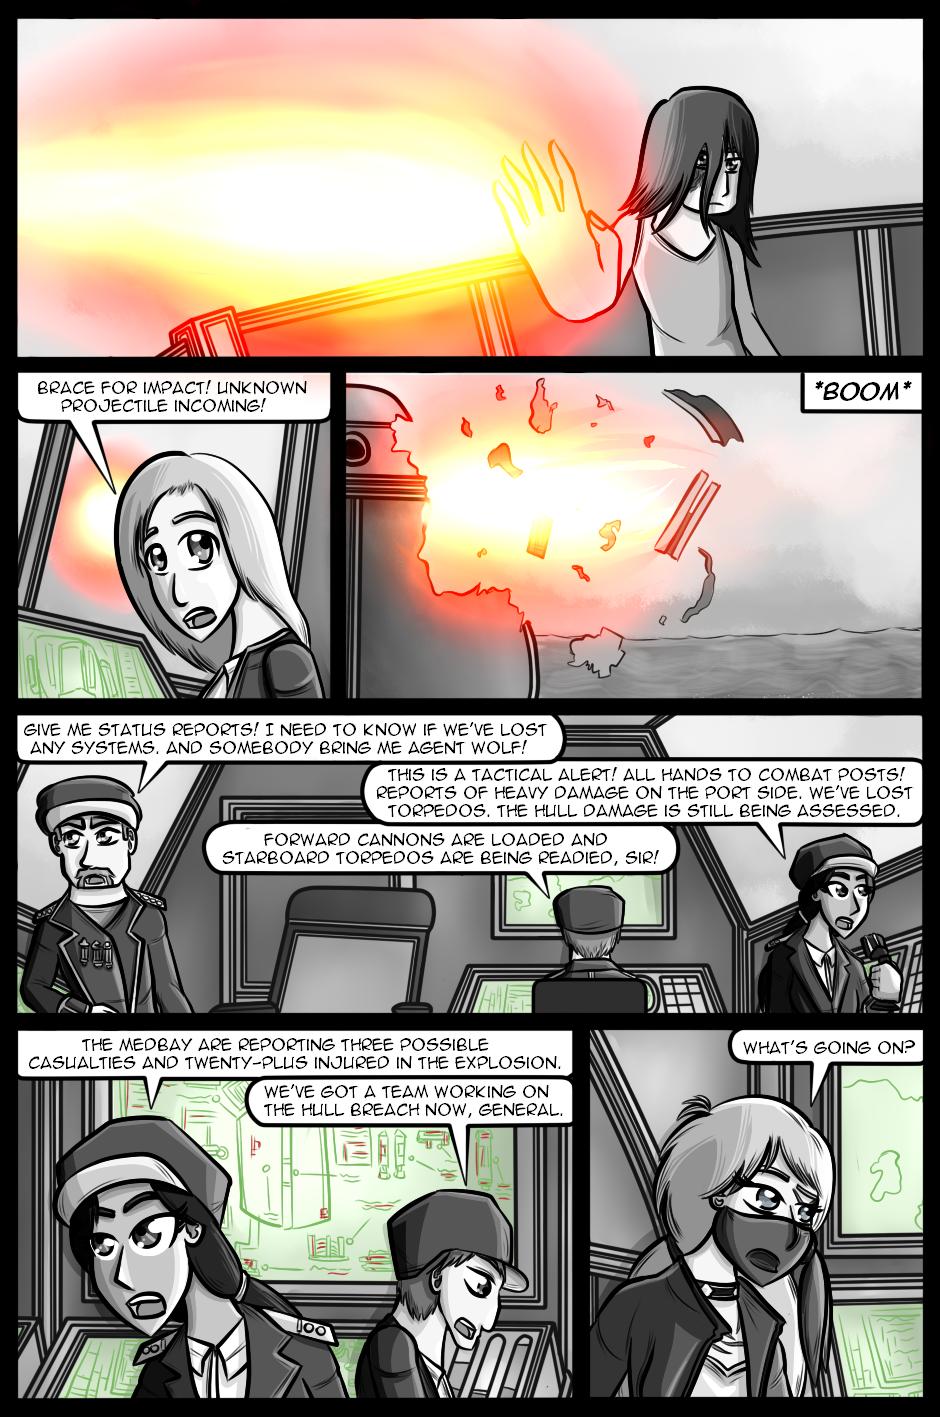 Fire Suppression, Part 23